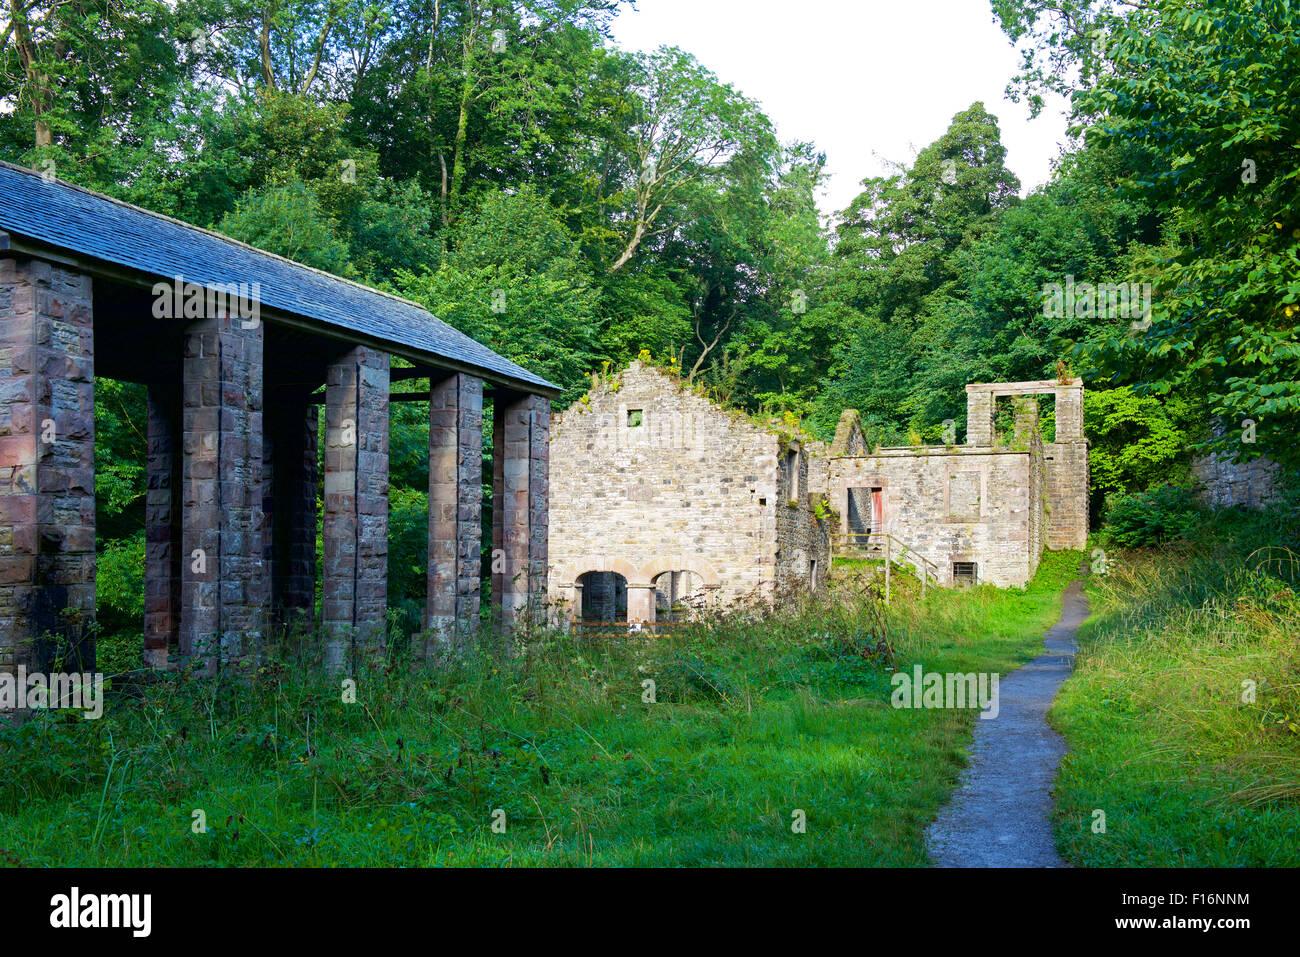 Ruins of the Howk bobbin mill, Caldbeck, Cumbria, England UK - Stock Image